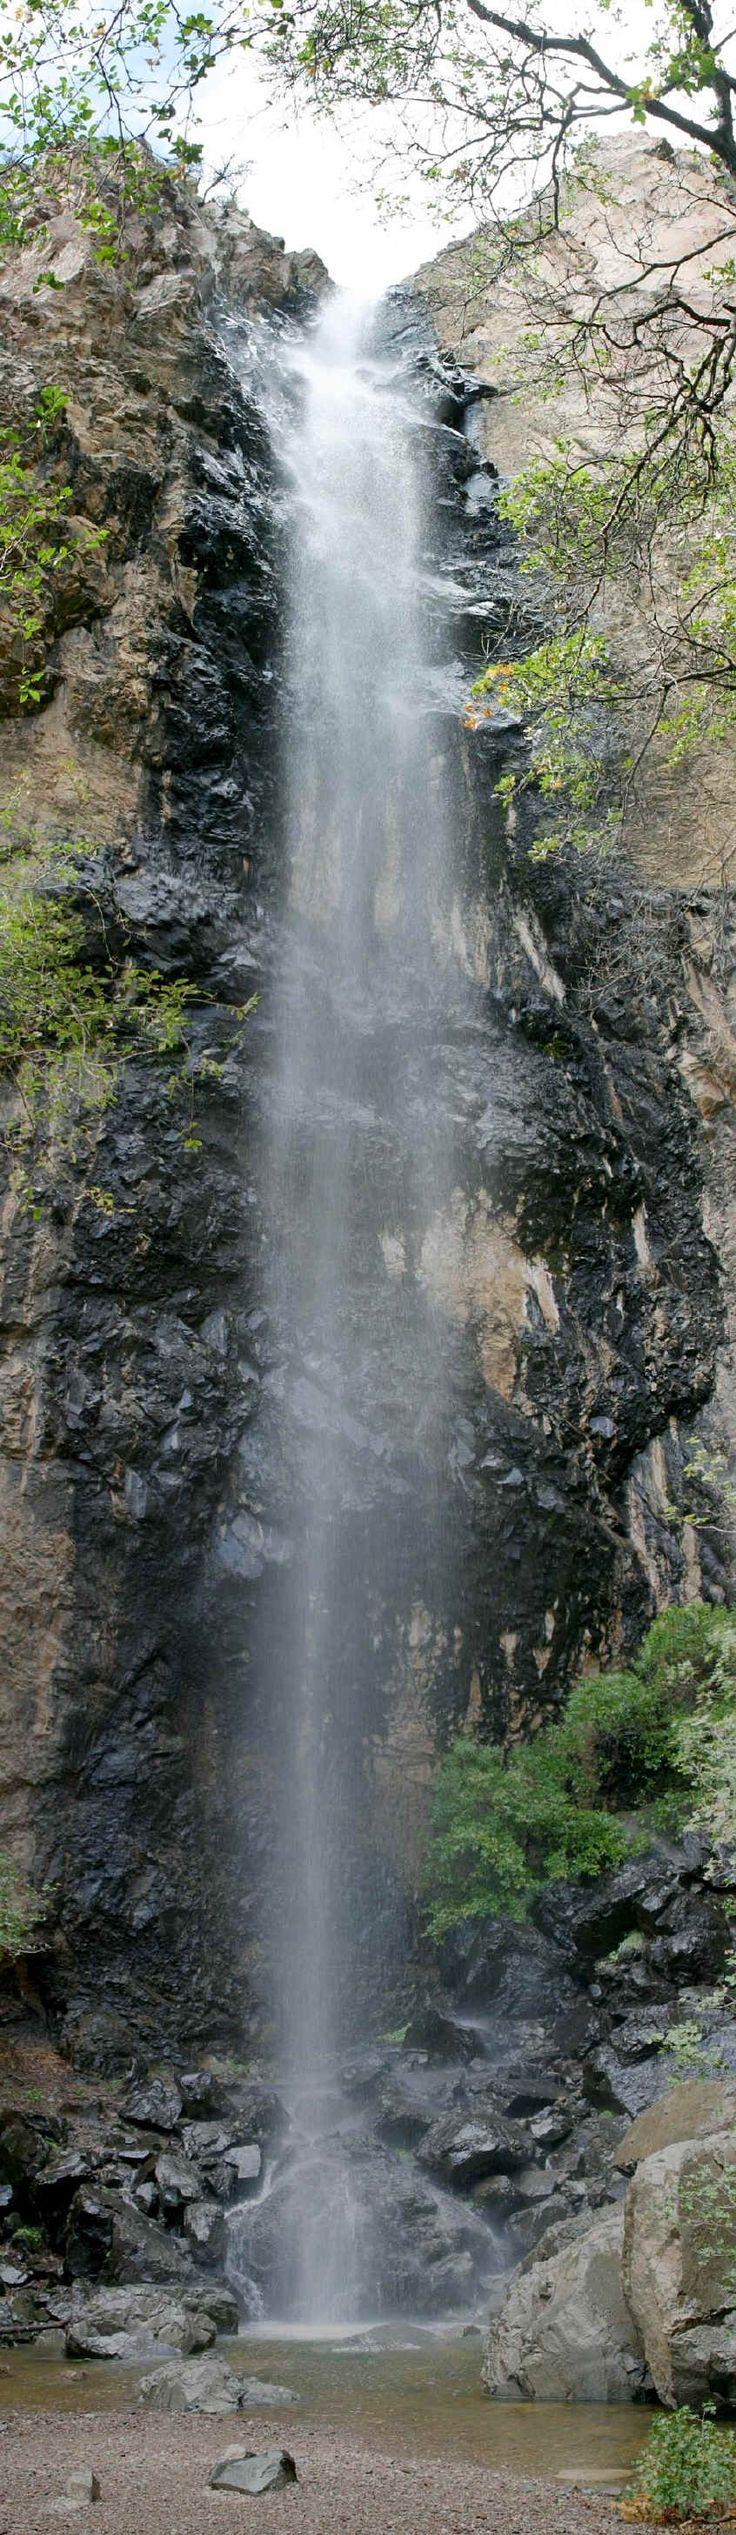 Pine Canyon Falls in Big Bend NP, Texas. http://en.wikipedia.org/wiki/File:Pine_Canyon_Falls_Pan.jpg